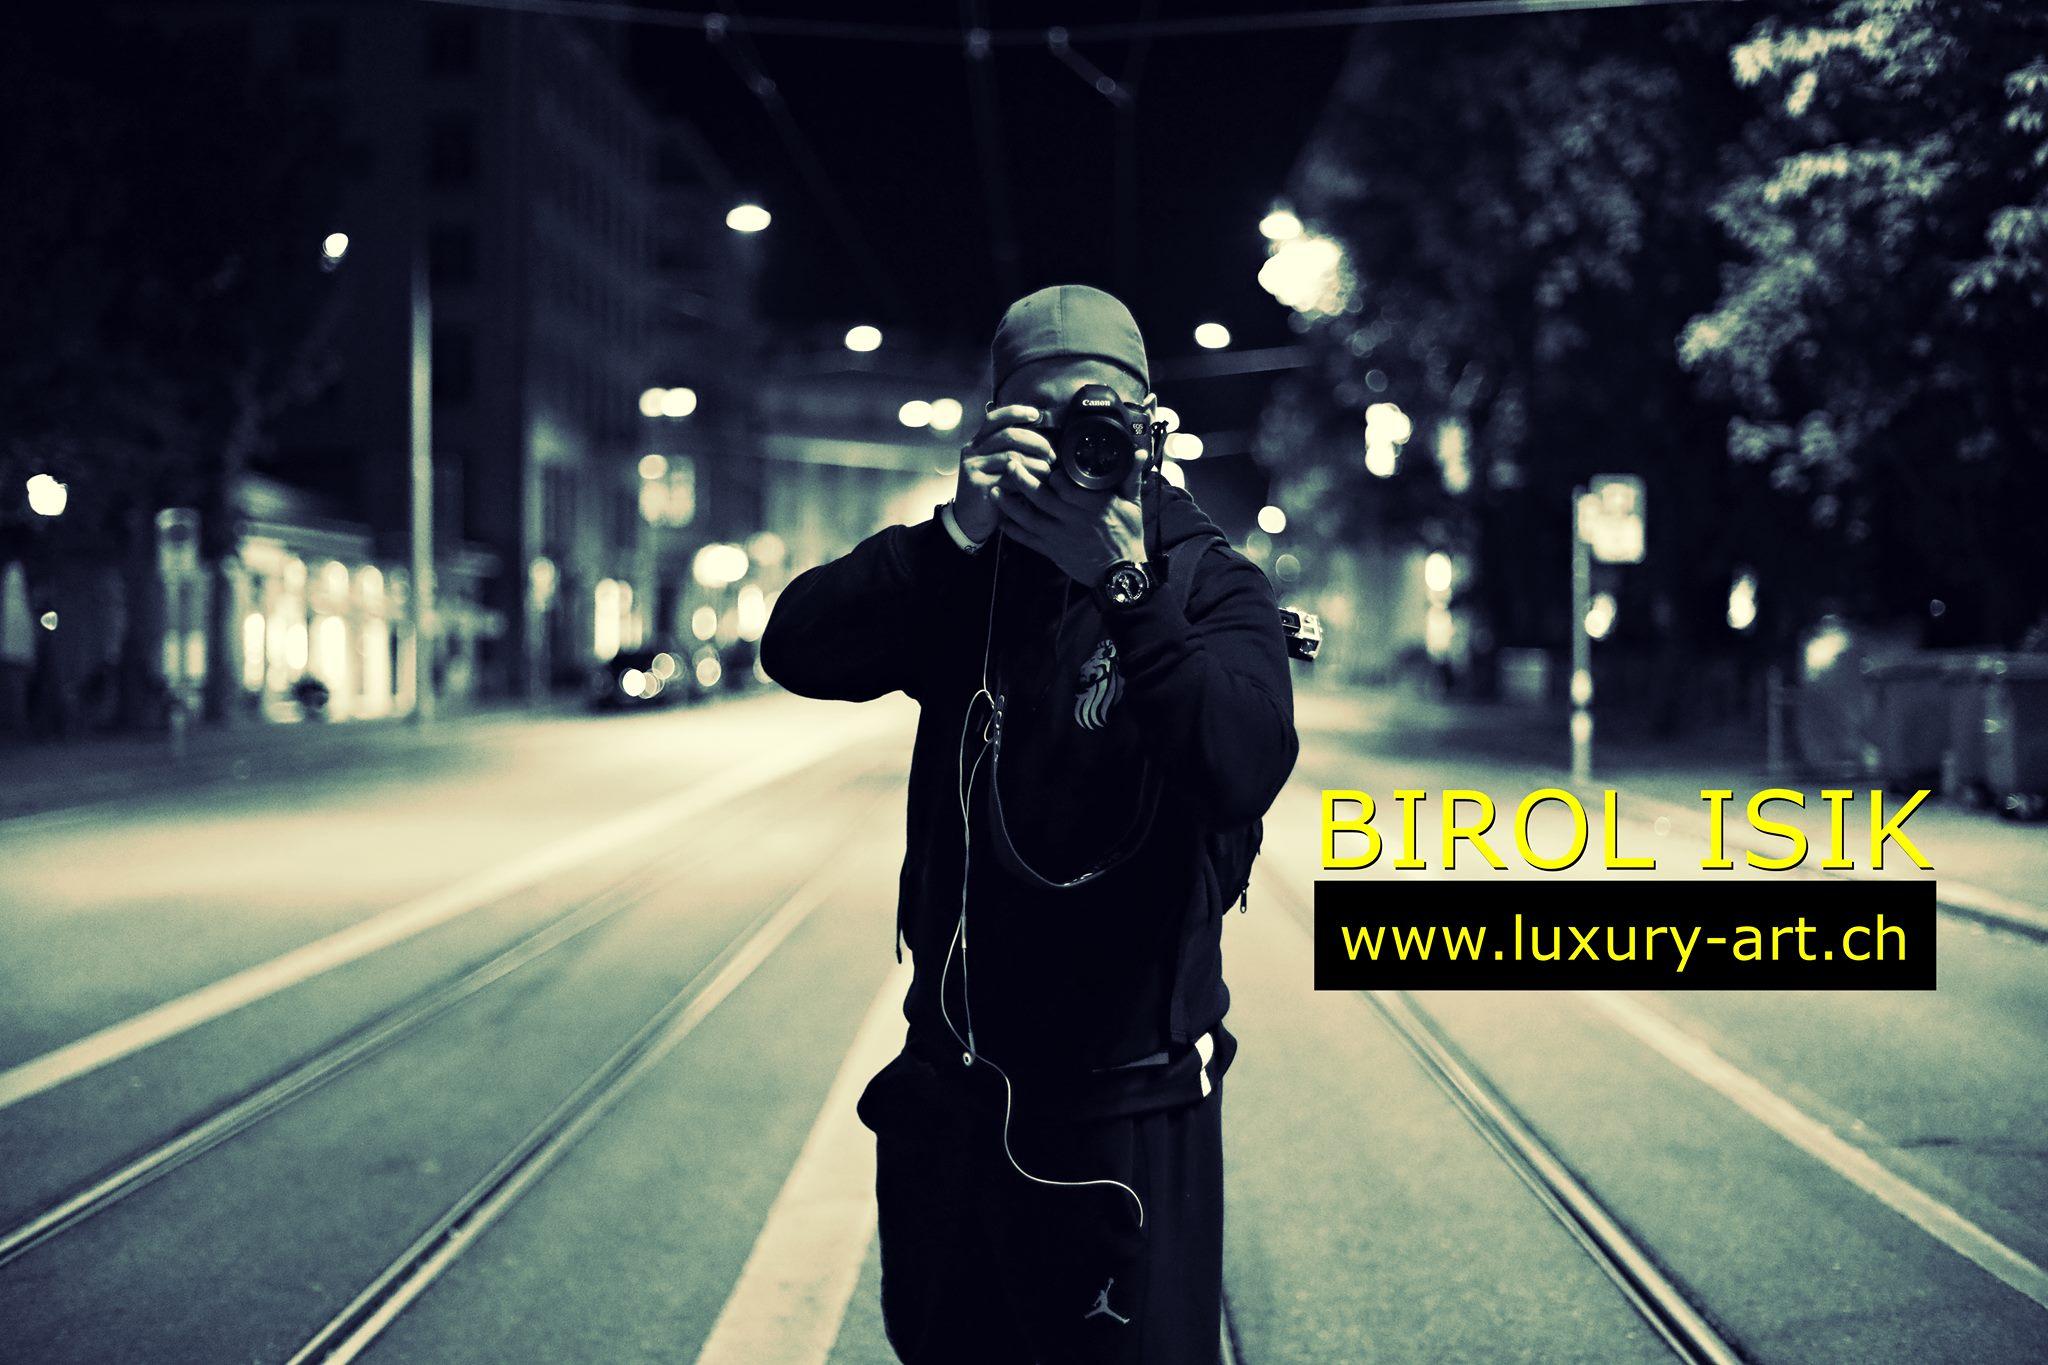 Birol Isik - Fotografie - Coaching